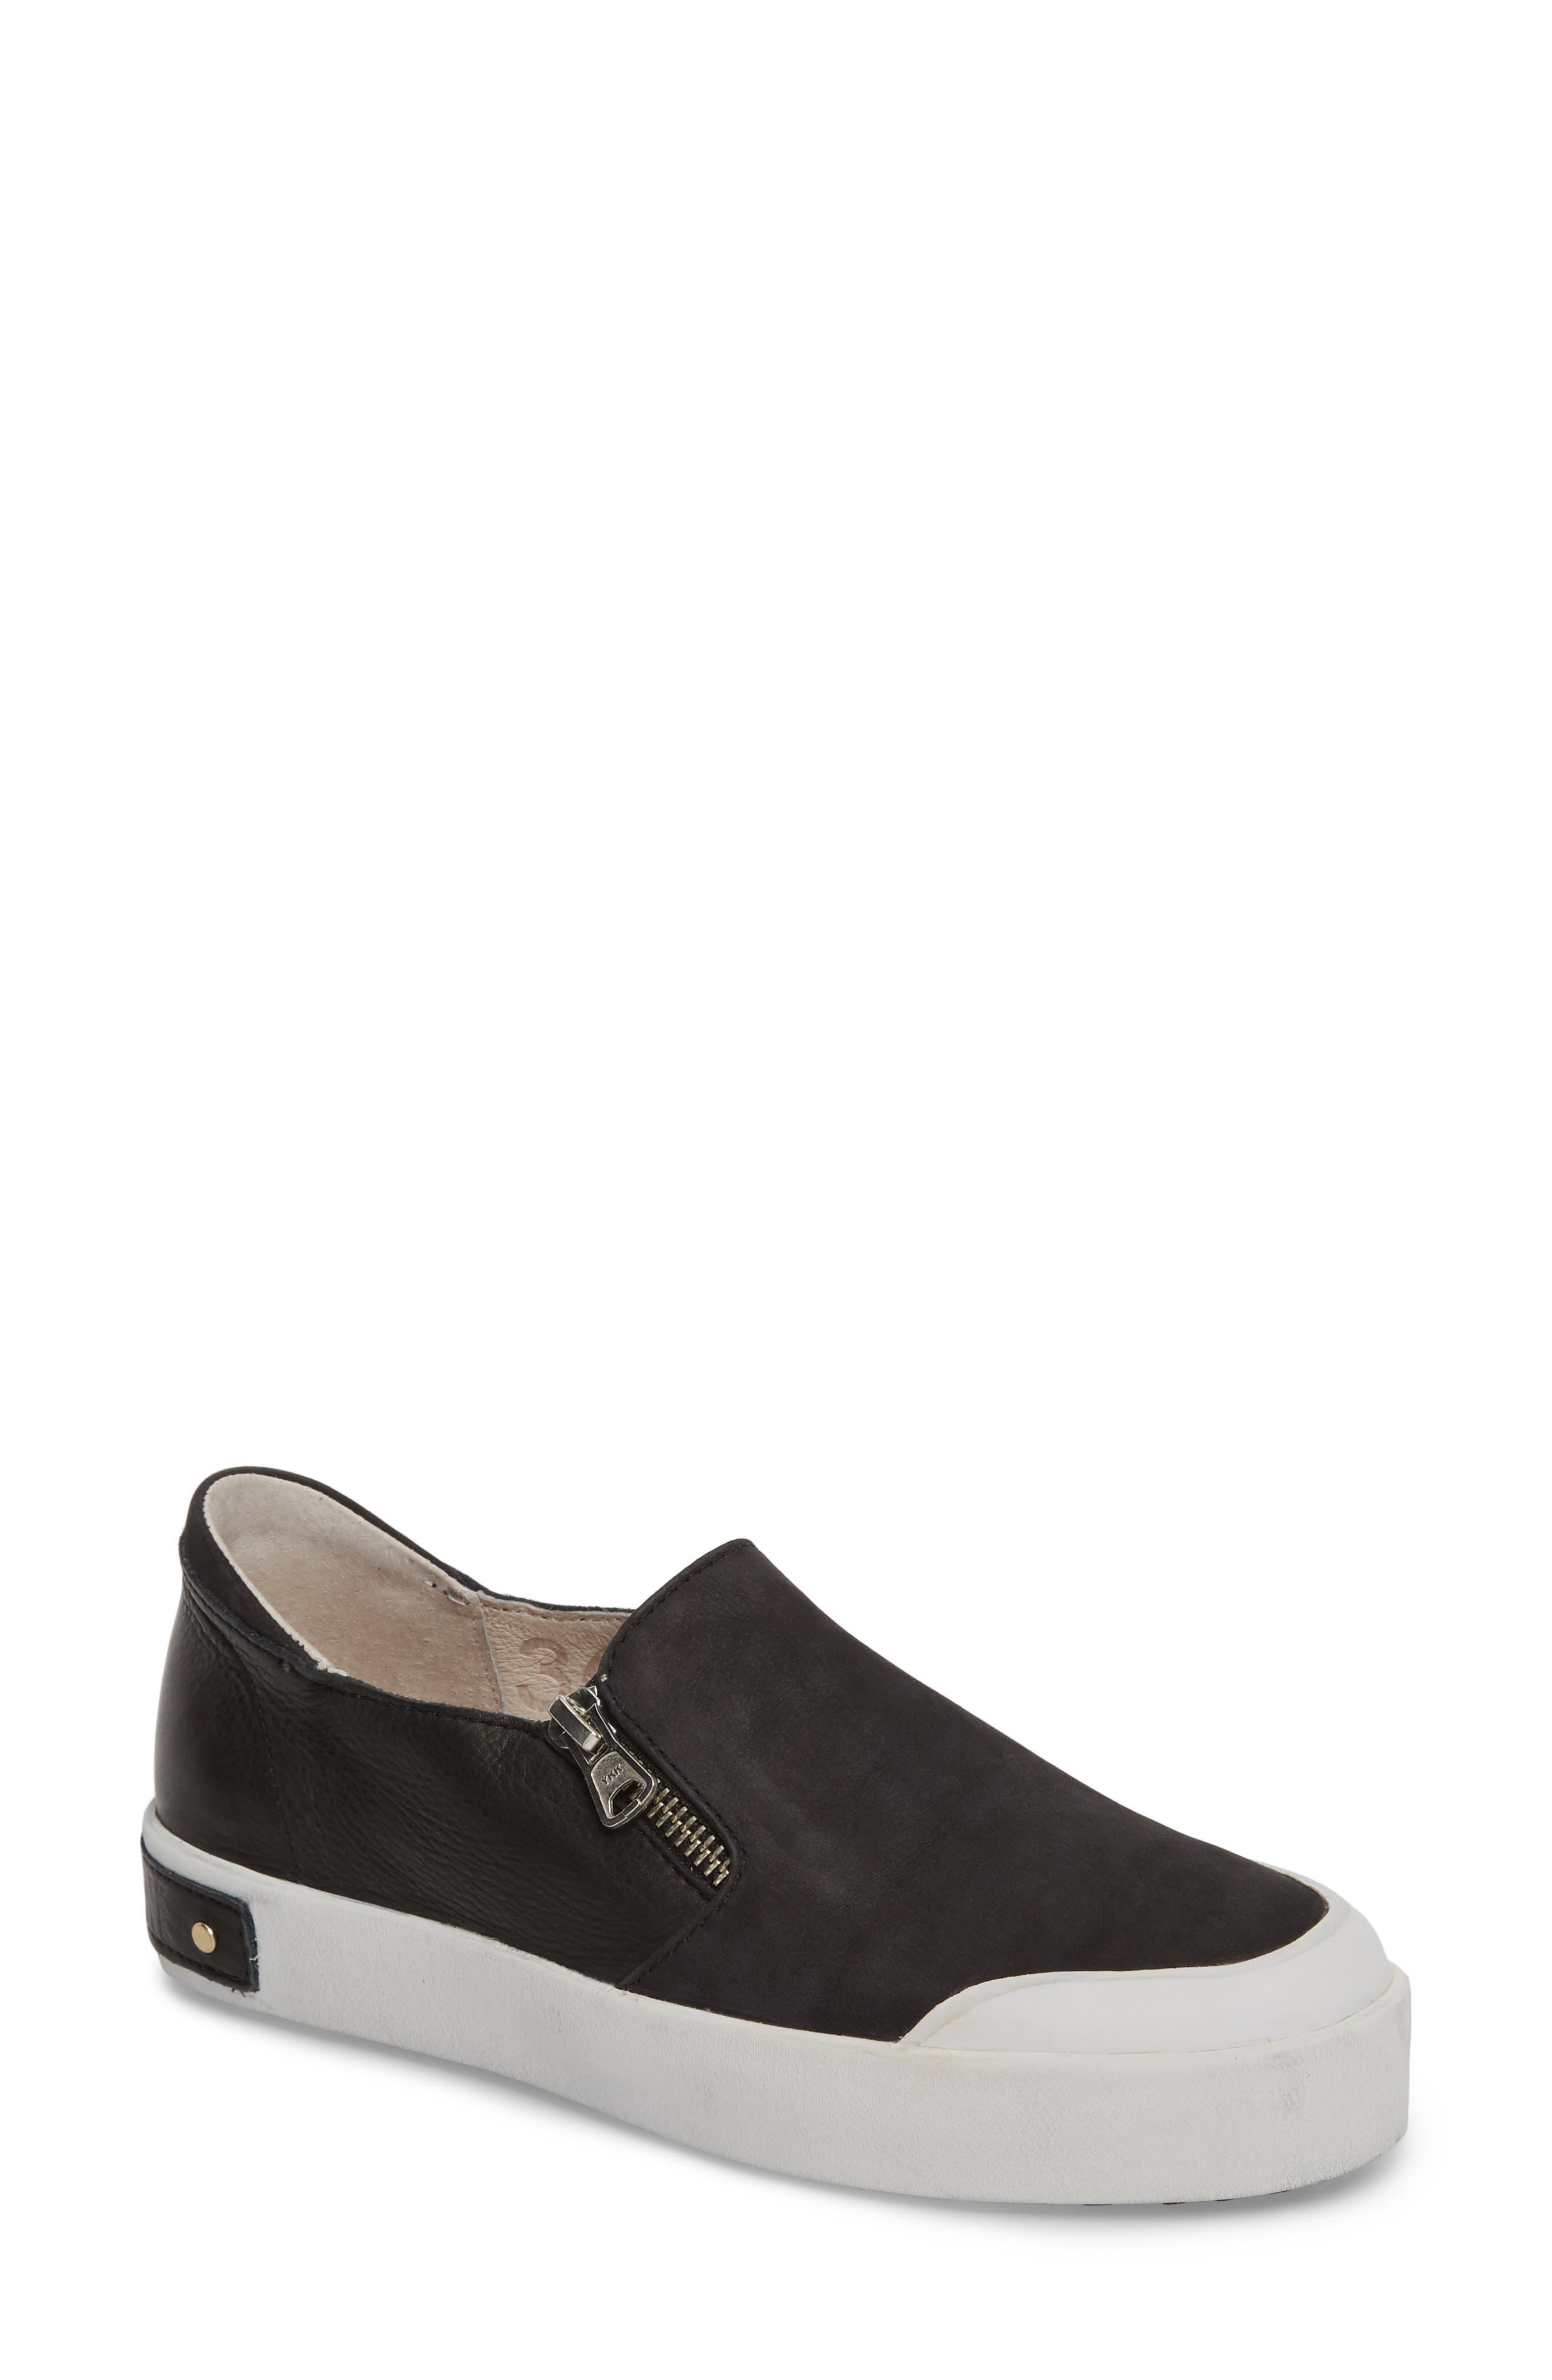 Blackstone Pl82 Slip-On Sneaker Black